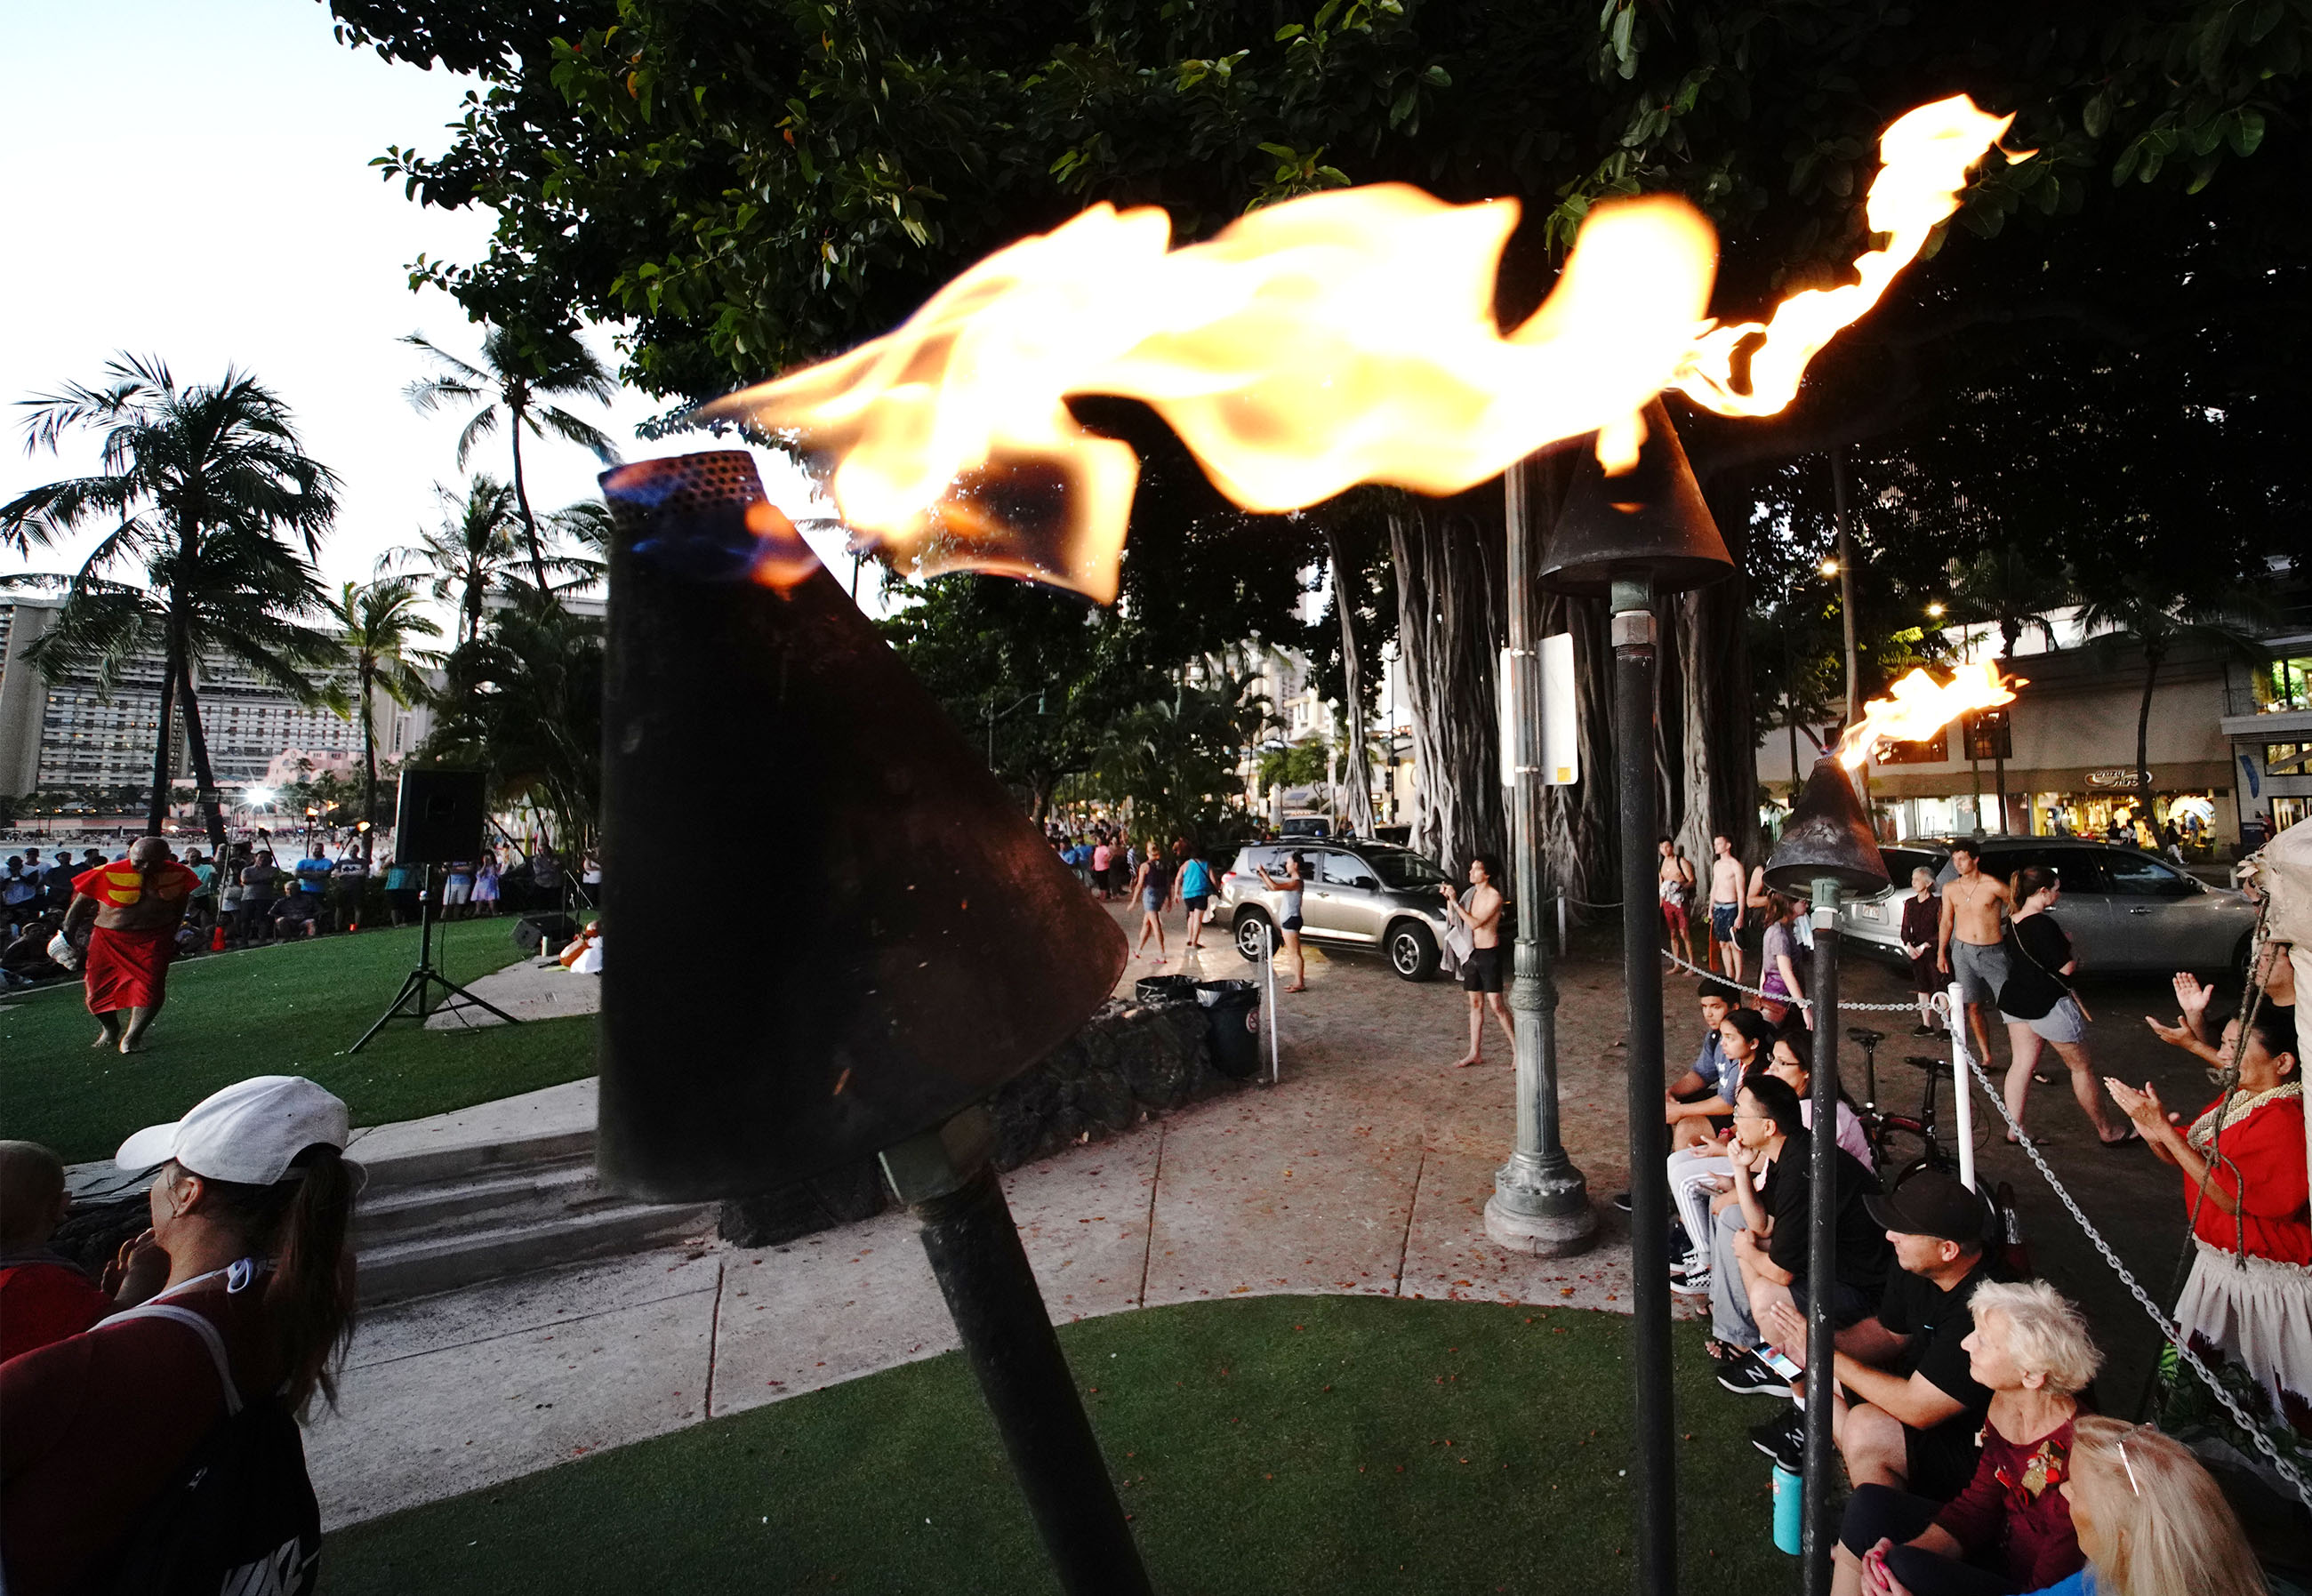 Gas Torches lit up near the Kuhio Beach Park hula mound.